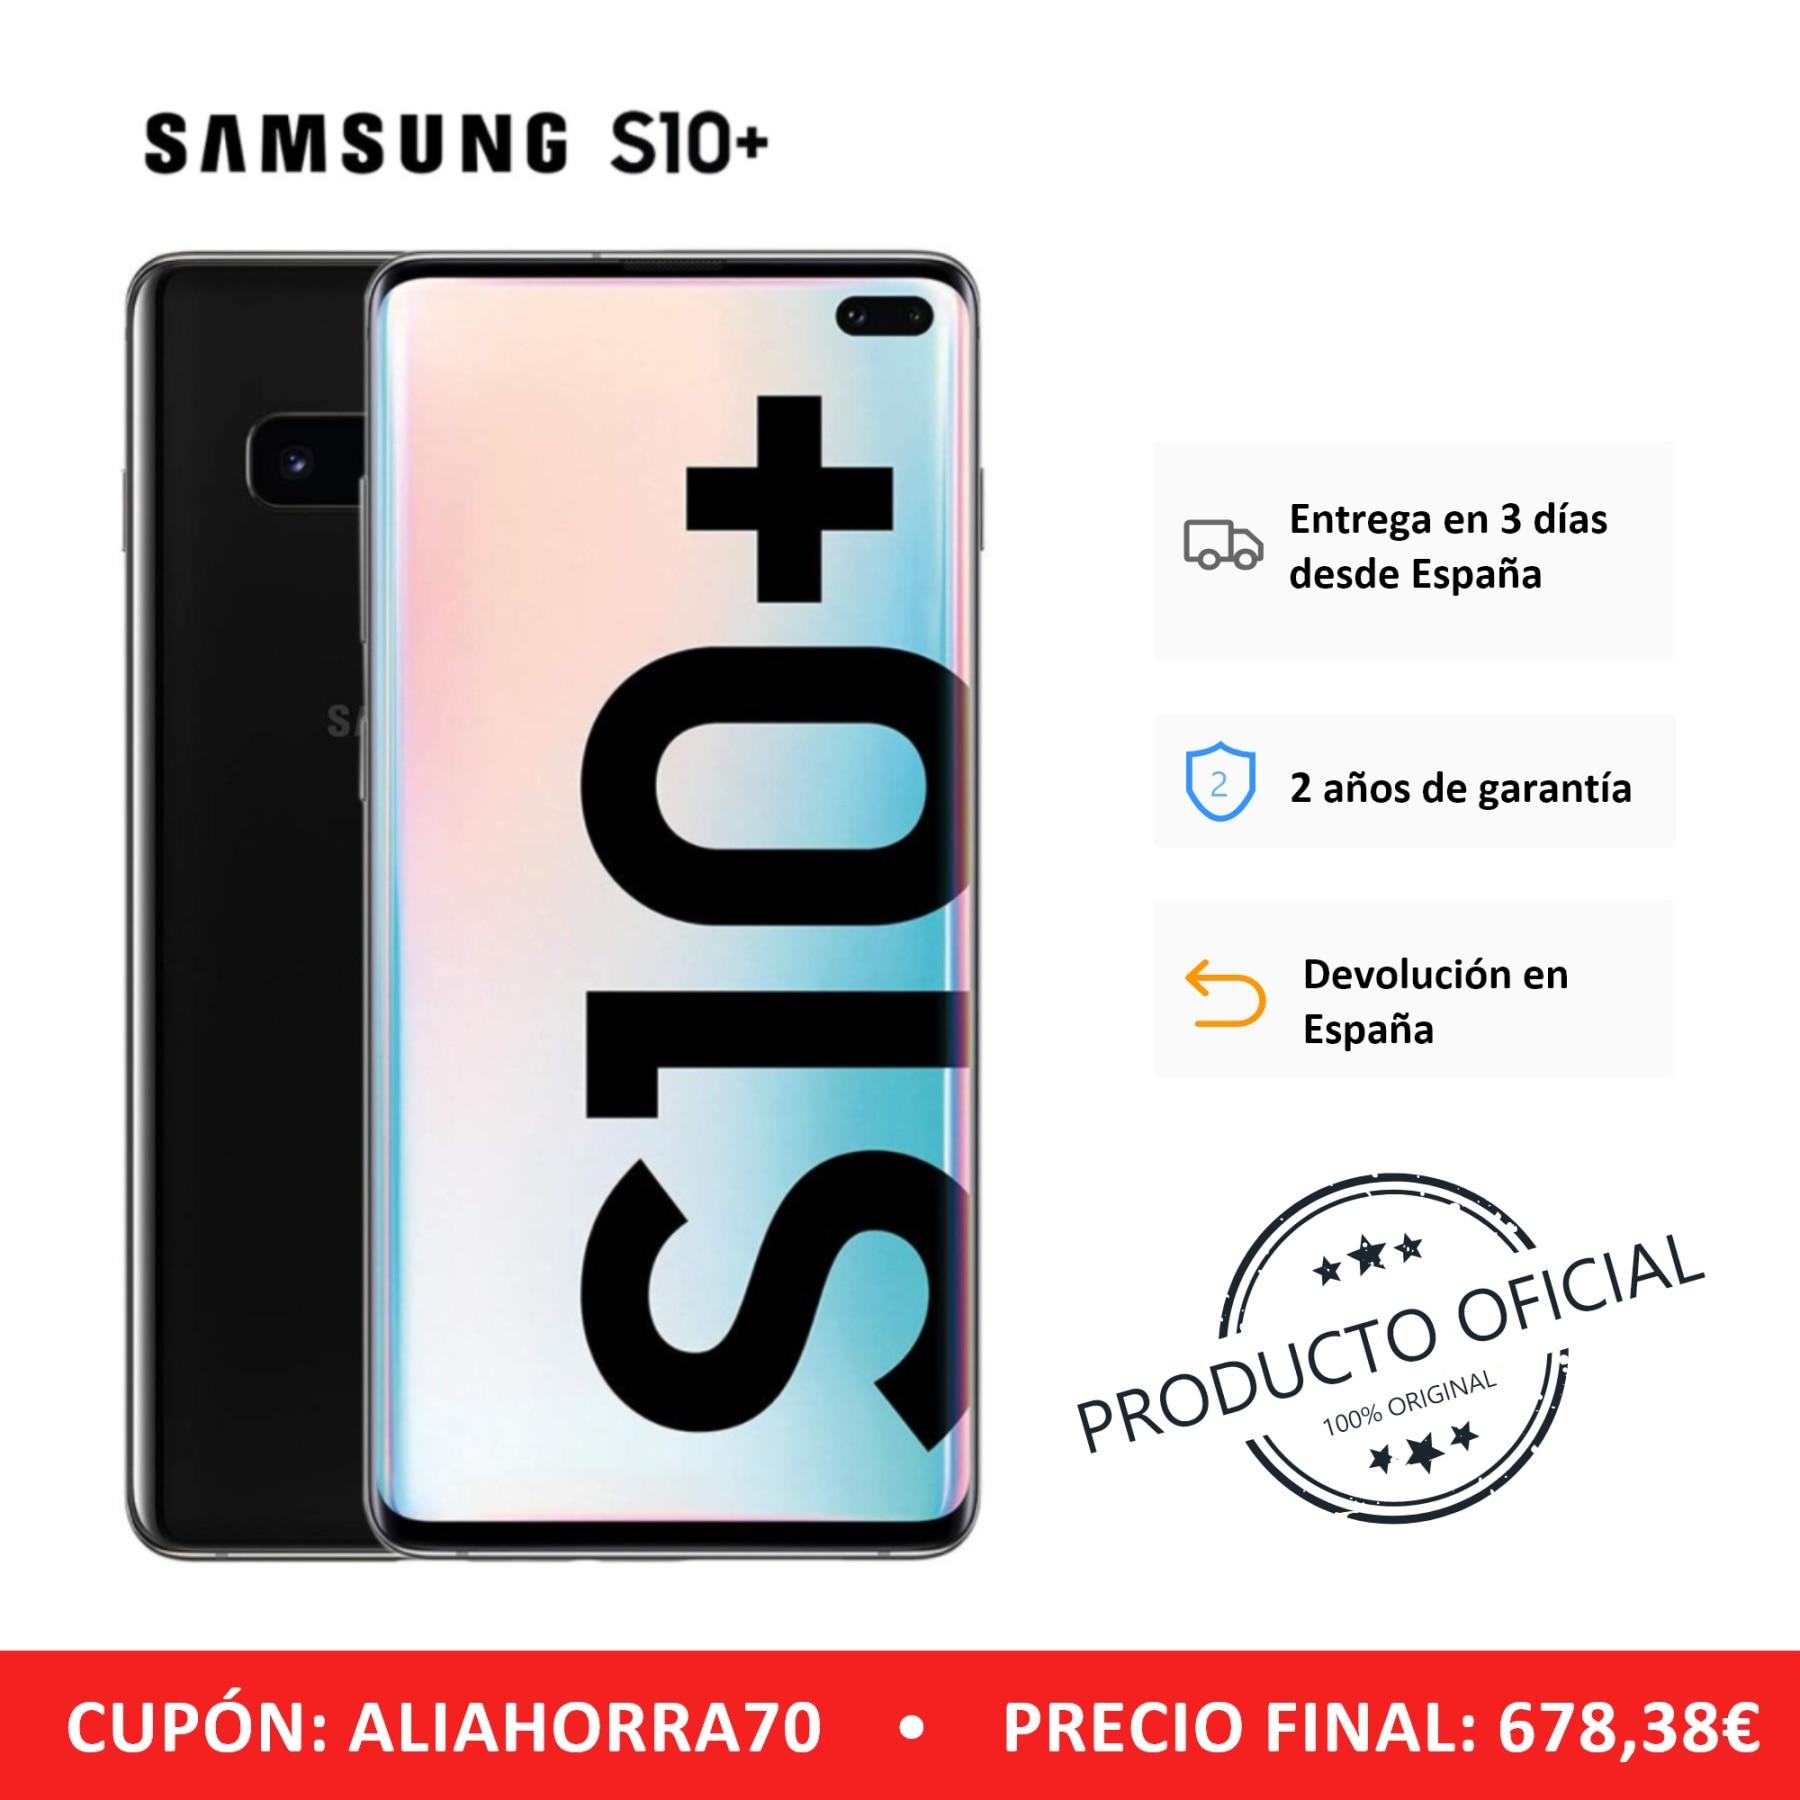 Samsung galaxy s10 +, banda lte/wifi, sim duplo, cor preta (preto), 12 8 gb memoria interna, 8 gb ram, tela d